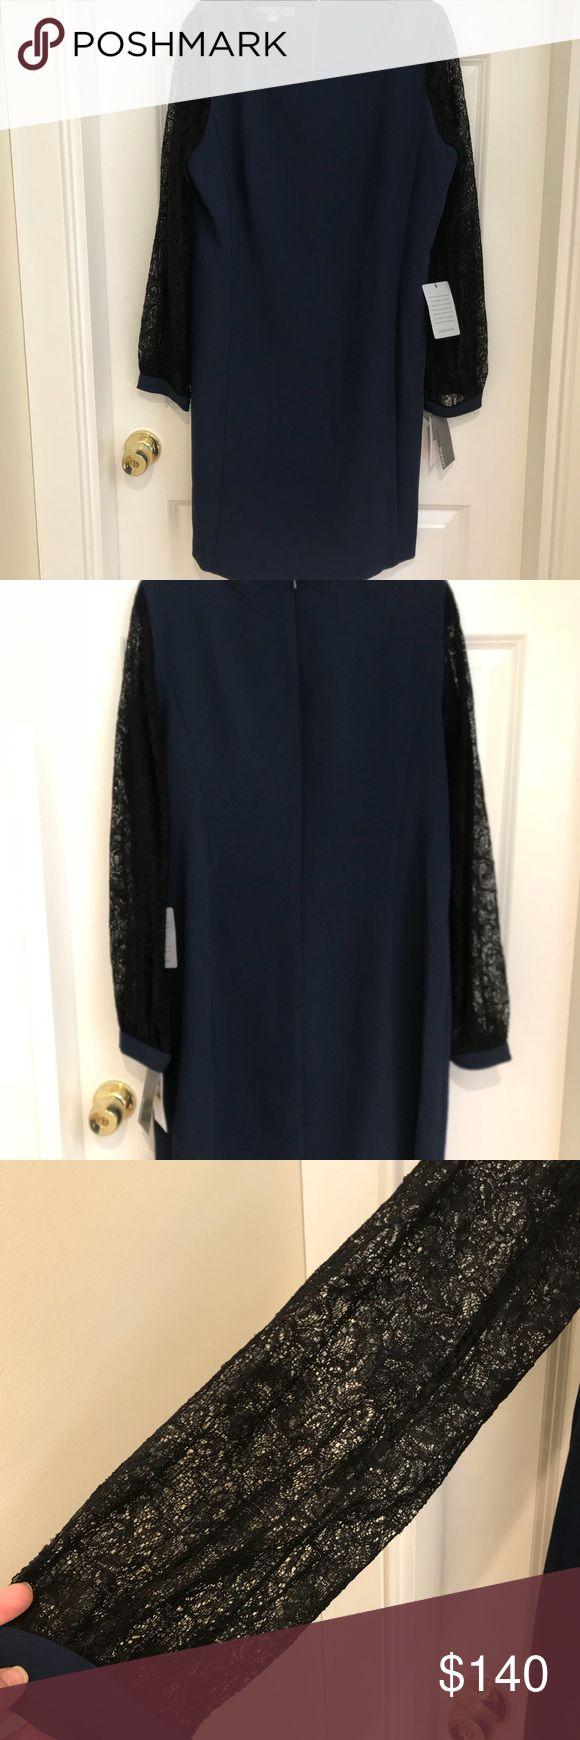 I just added this listing on Poshmark: Donna Ricco Navy/Black Dress Size 14. #shopmycloset #poshmark #fashion #shopping #style #forsale #Donna Ricco #Dresses & Skirts